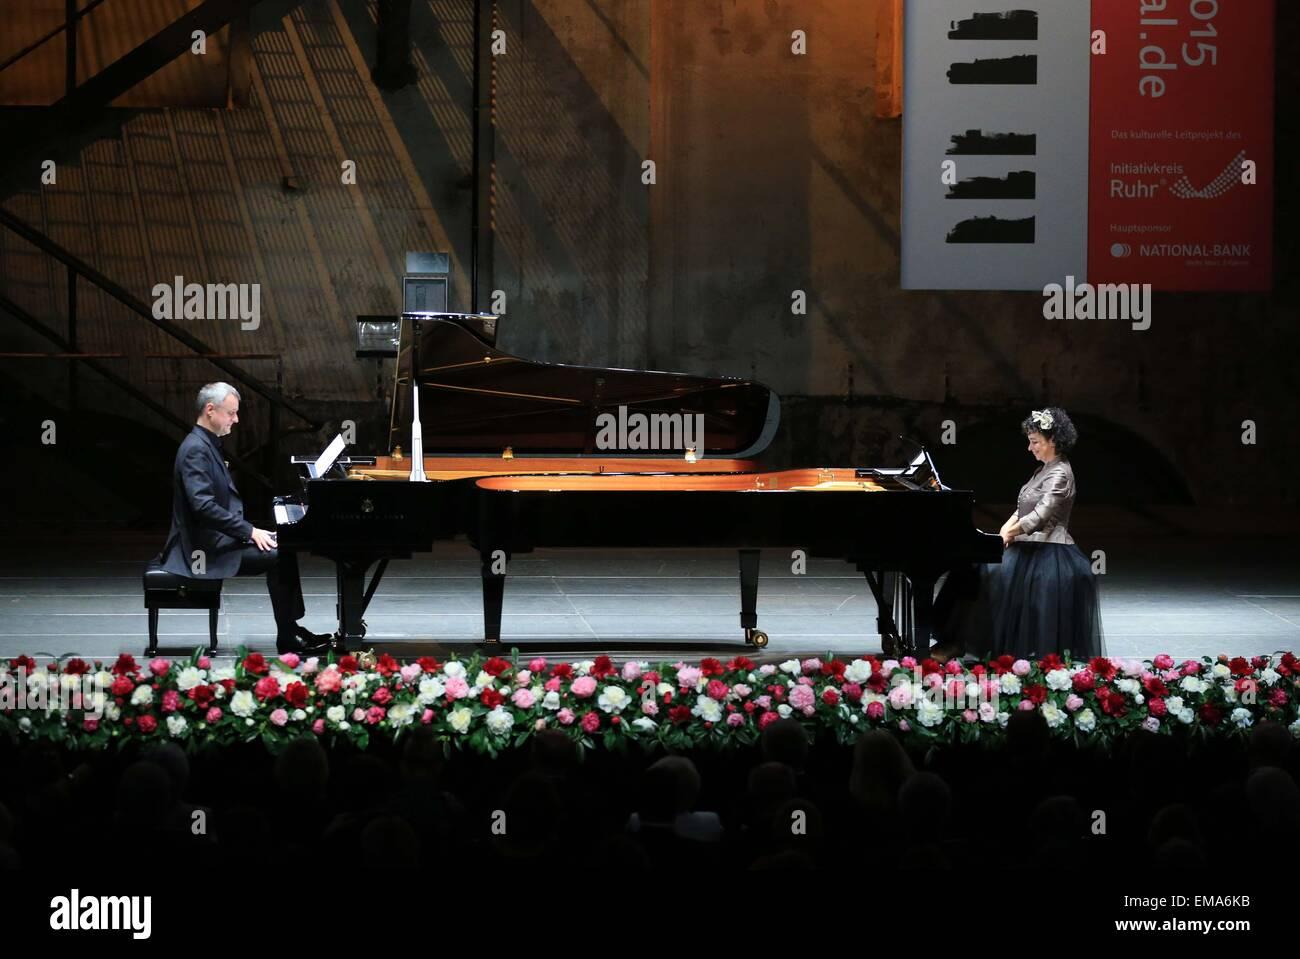 Frankfurt, Germany. 17th Apr, 2015. Israeli pianist Yaara Tal (R) and German pianist Andreas Groethuysen perform - Stock Image